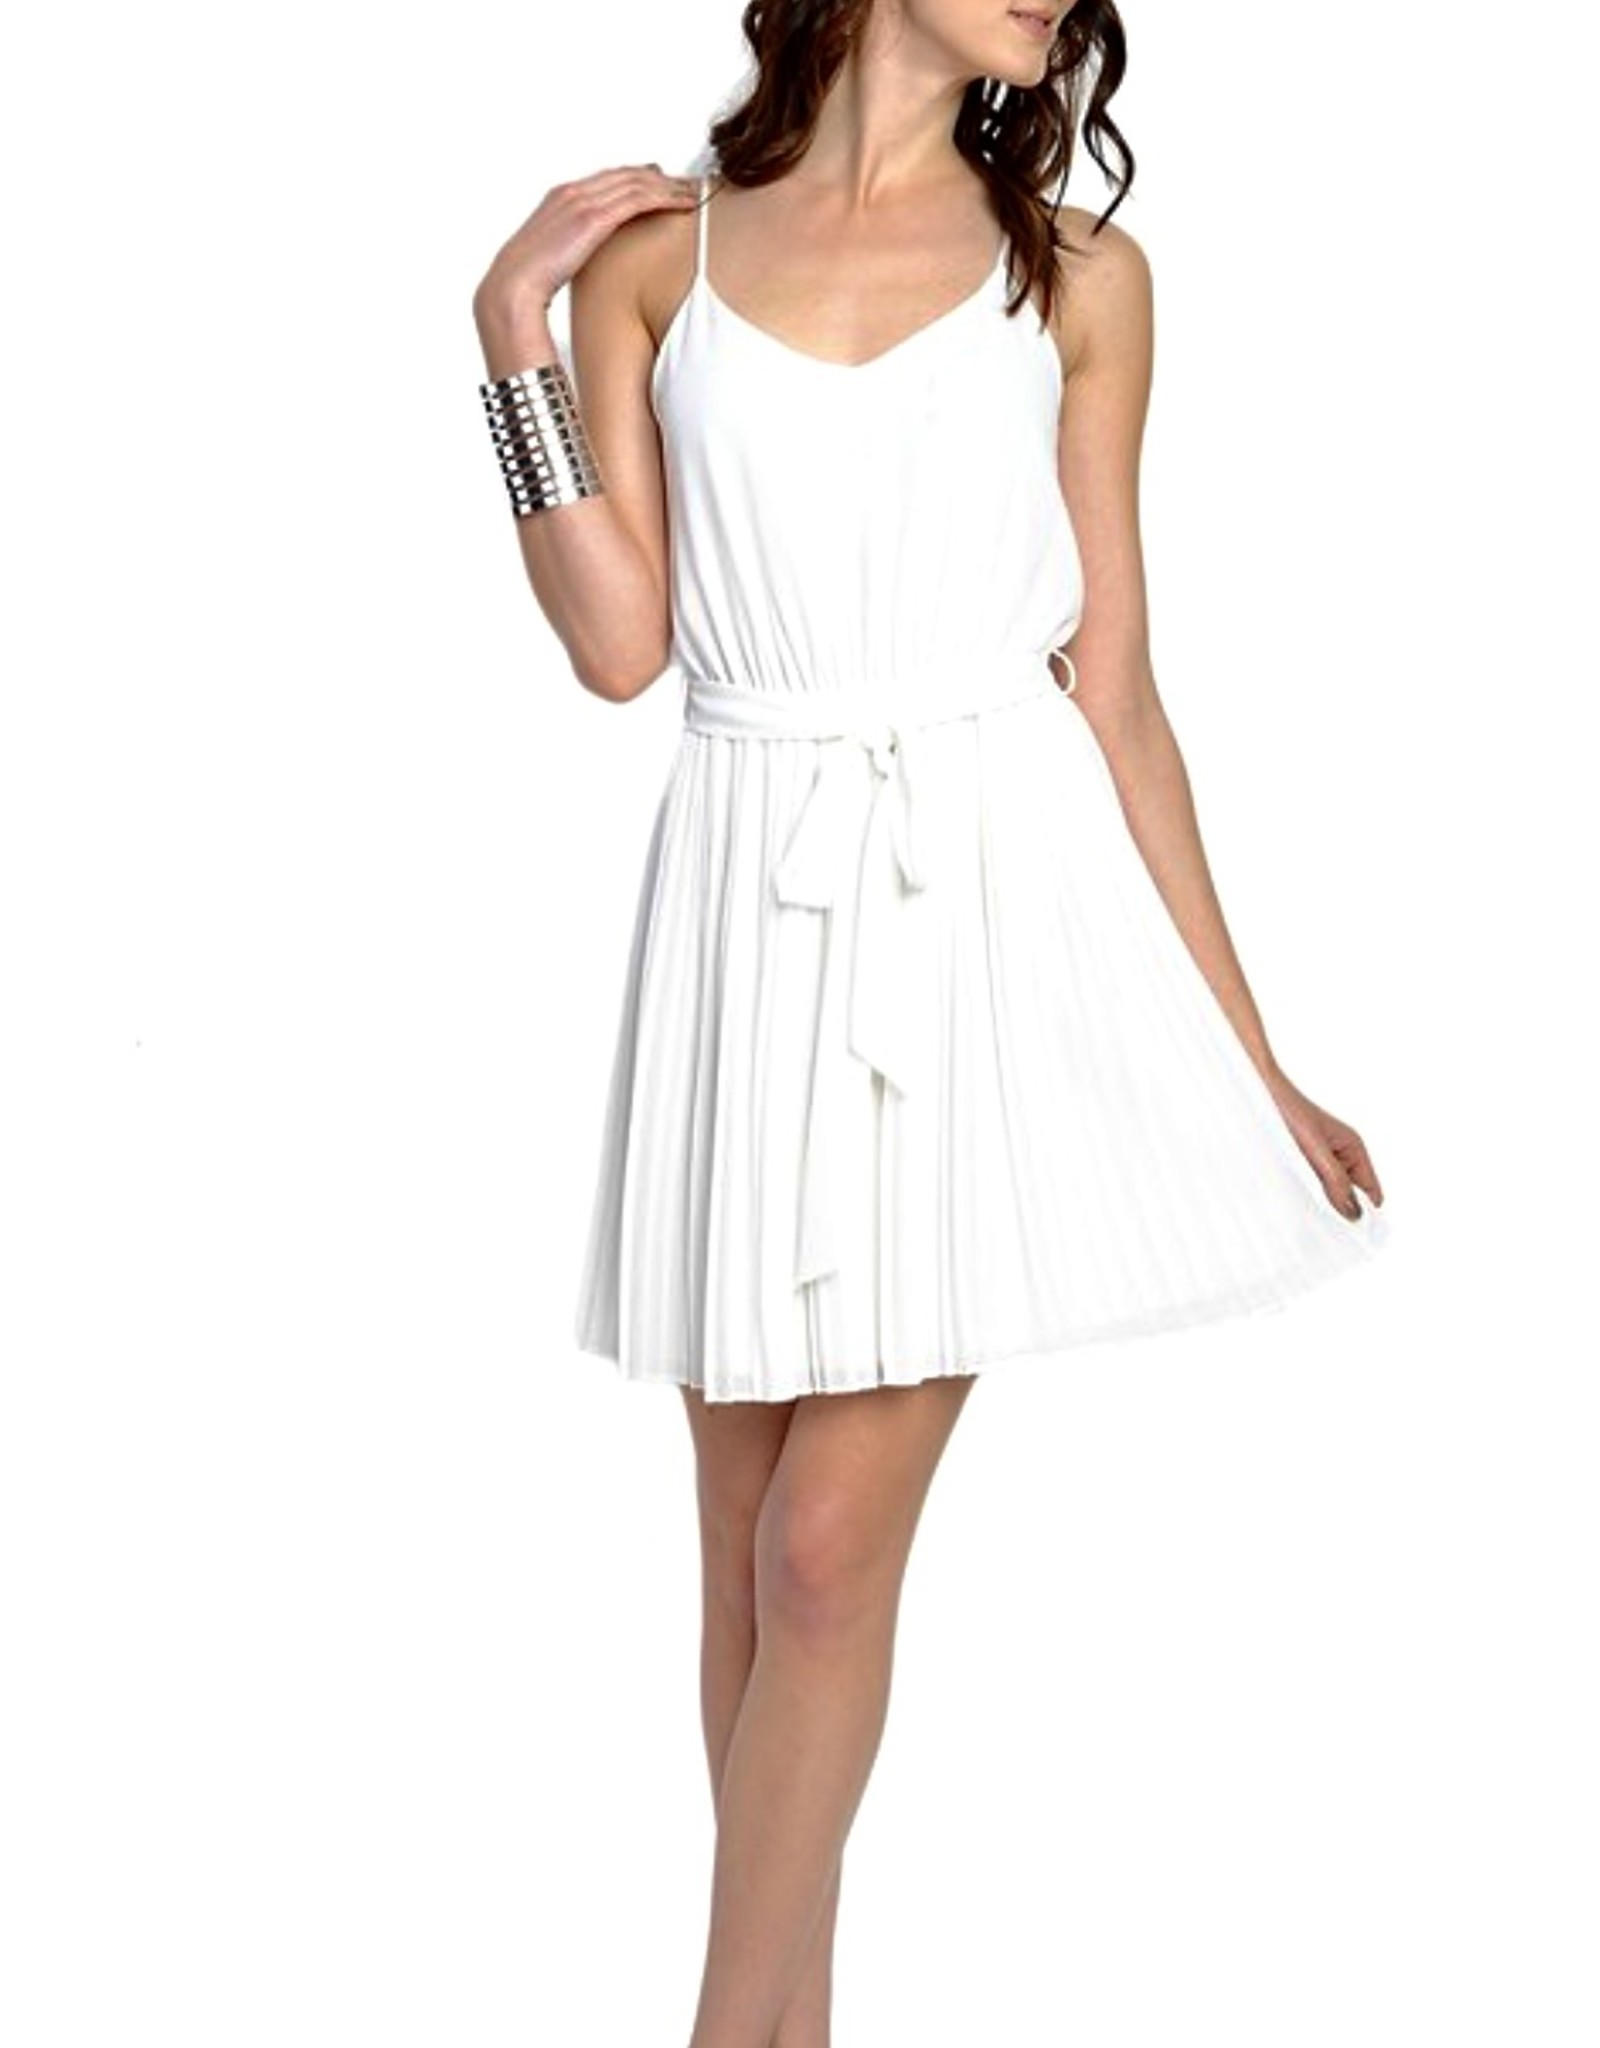 HUSH Halter style tie front knee length dress